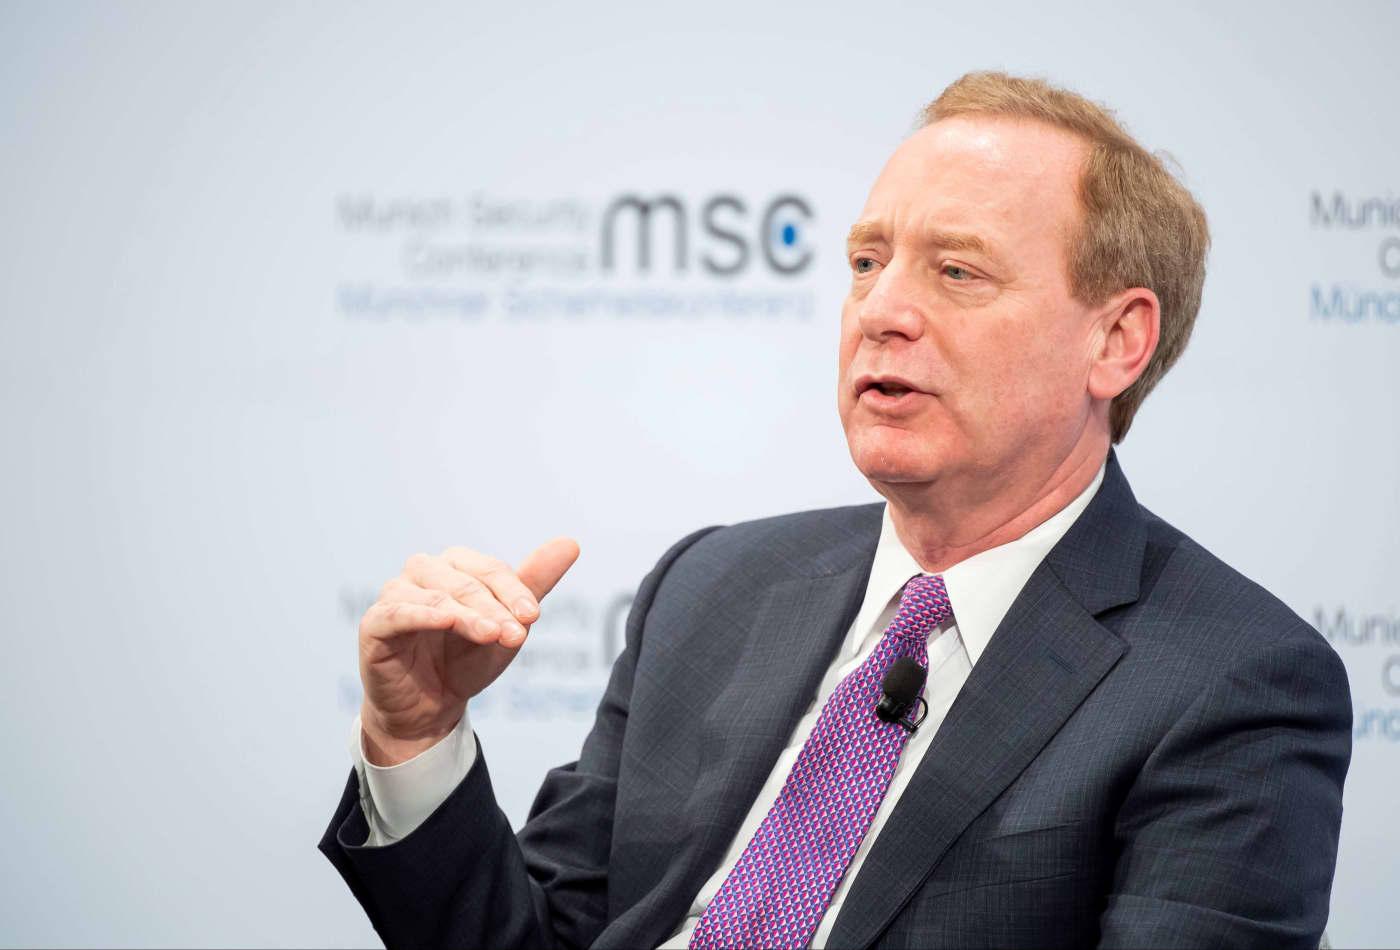 Microsoft president says big tech has 'fundamental responsibility' to protect US voting process